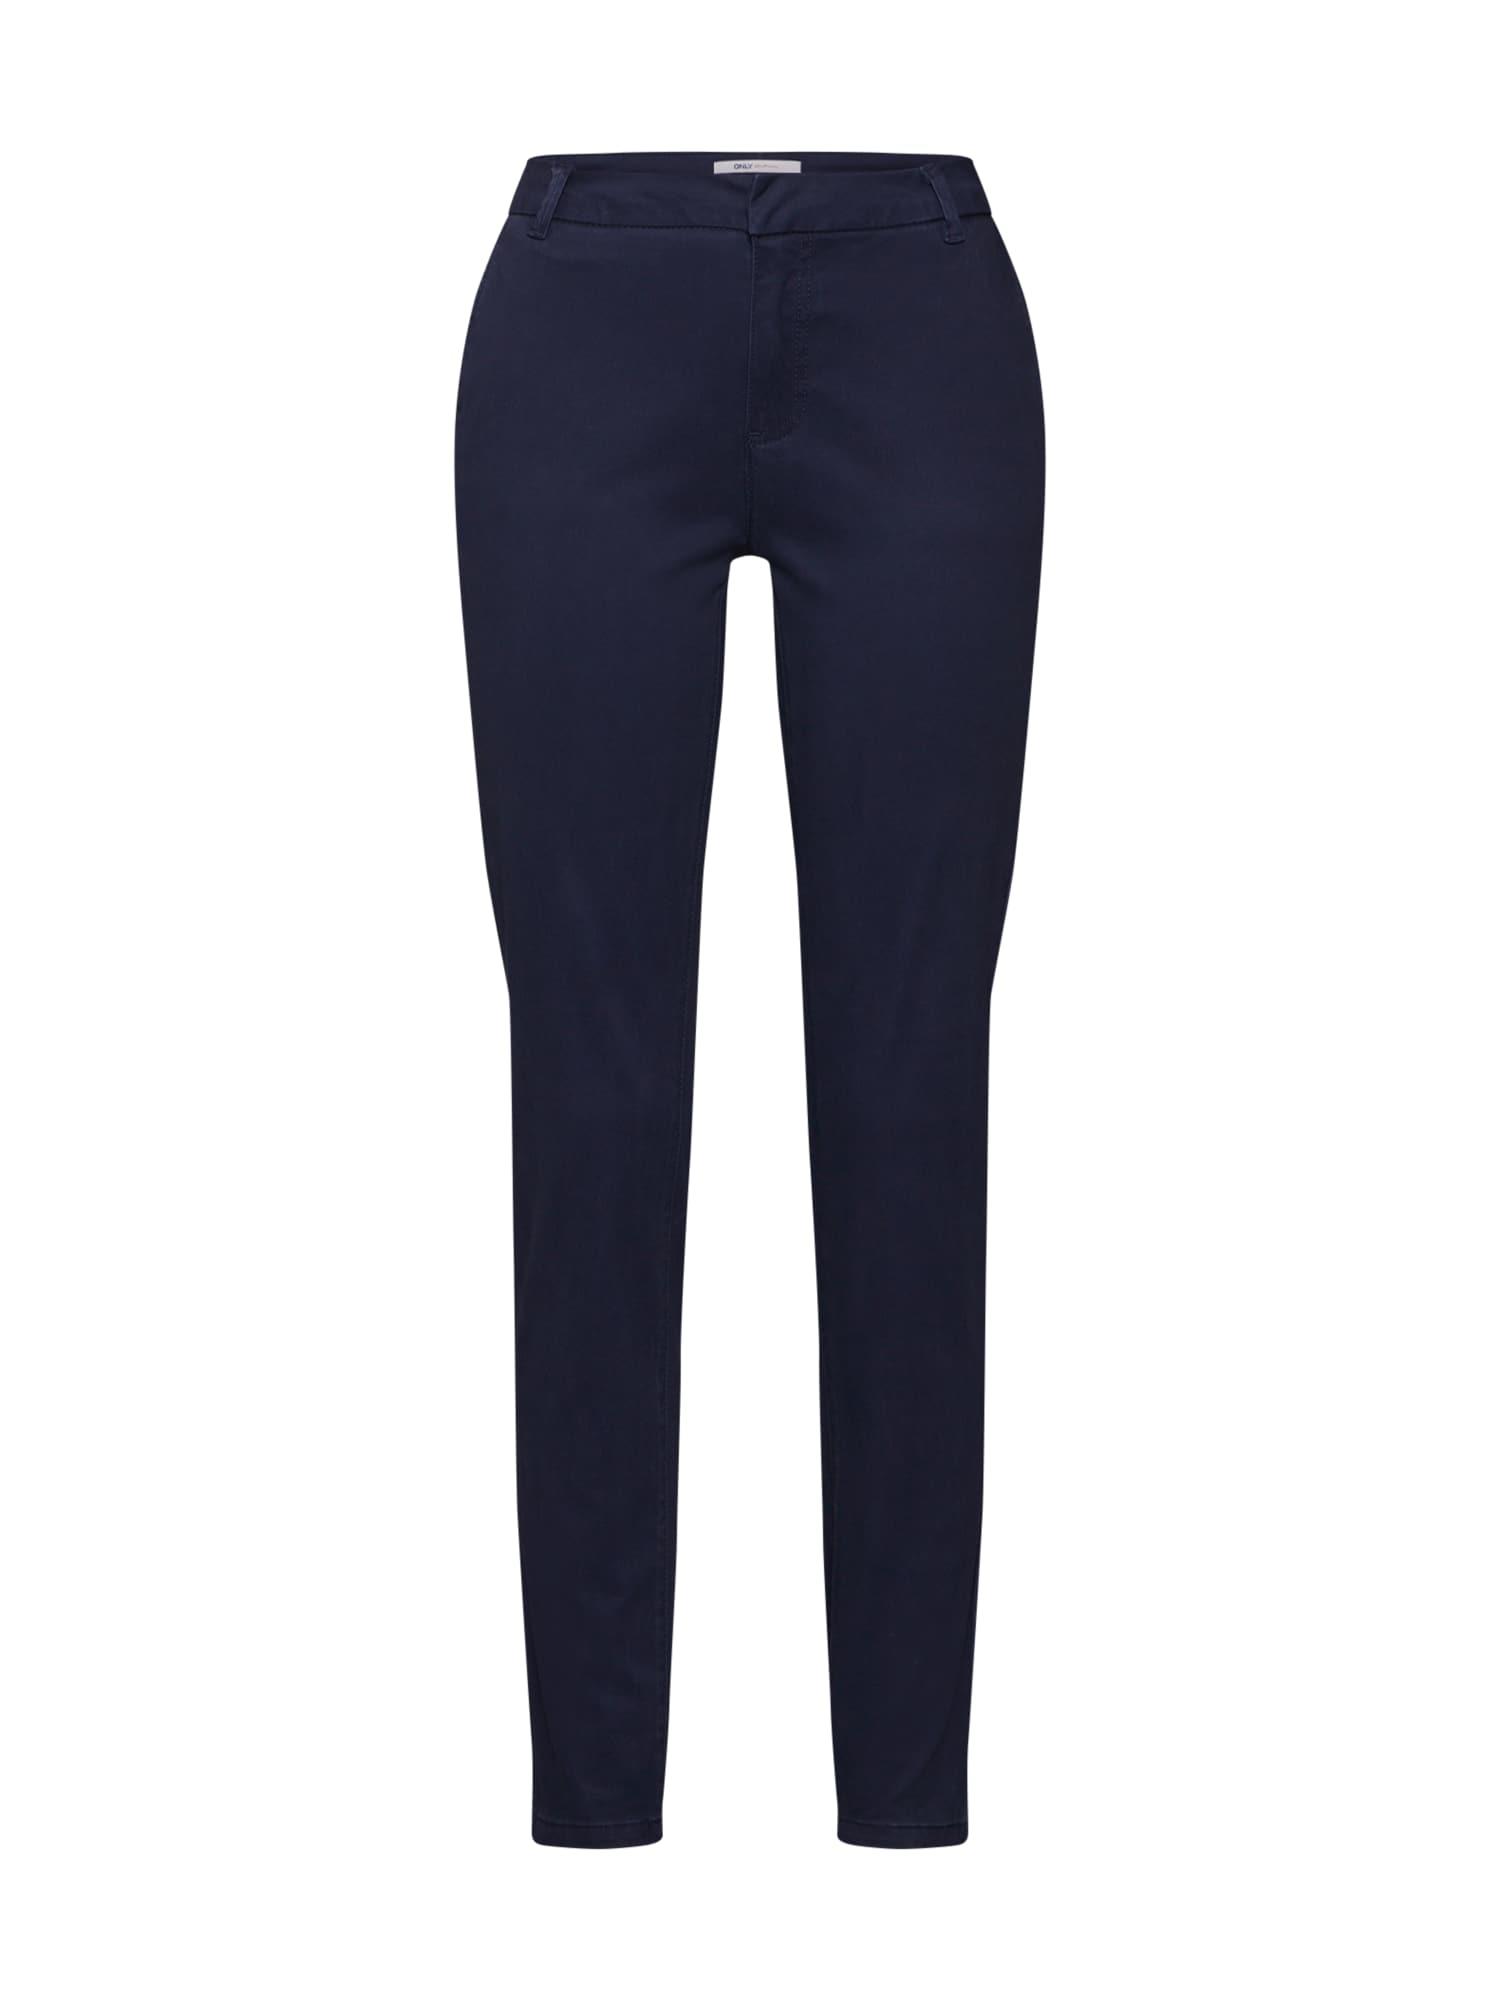 Kalhoty Monique nachtblau ONLY